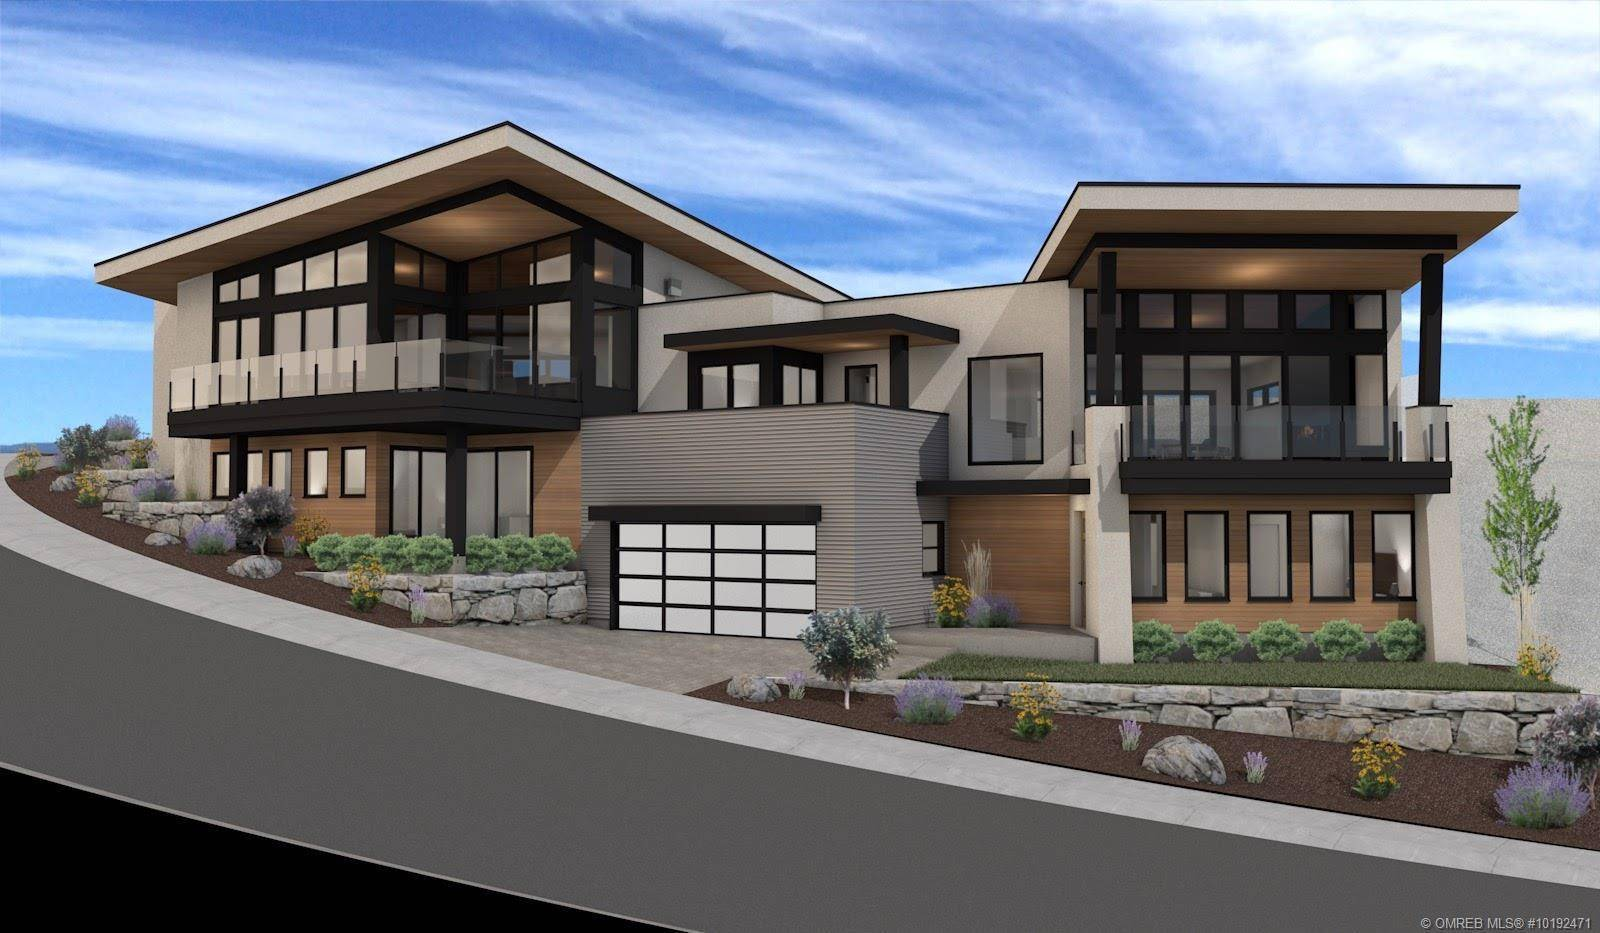 Home for sale at 3635 Mckinley Beach Dr Kelowna British Columbia - MLS: 10192471